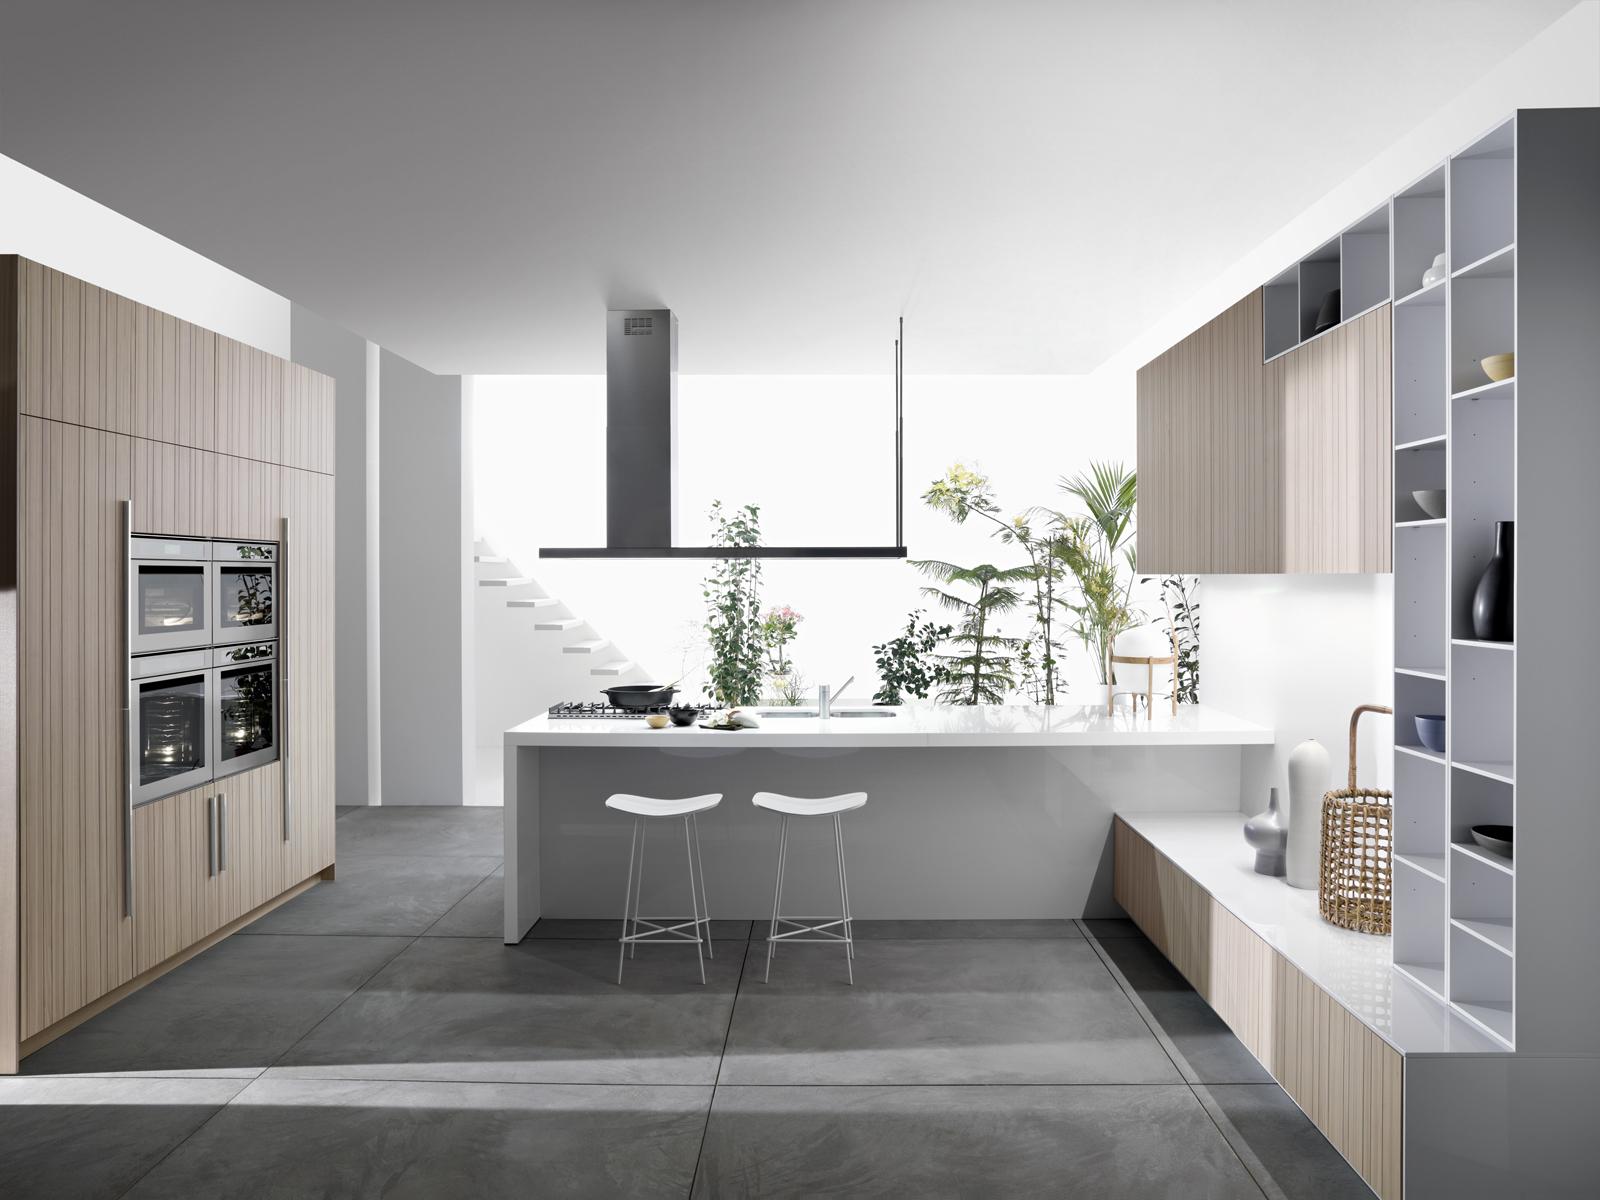 Code Natural kitchen by Snaidero Design straight shot